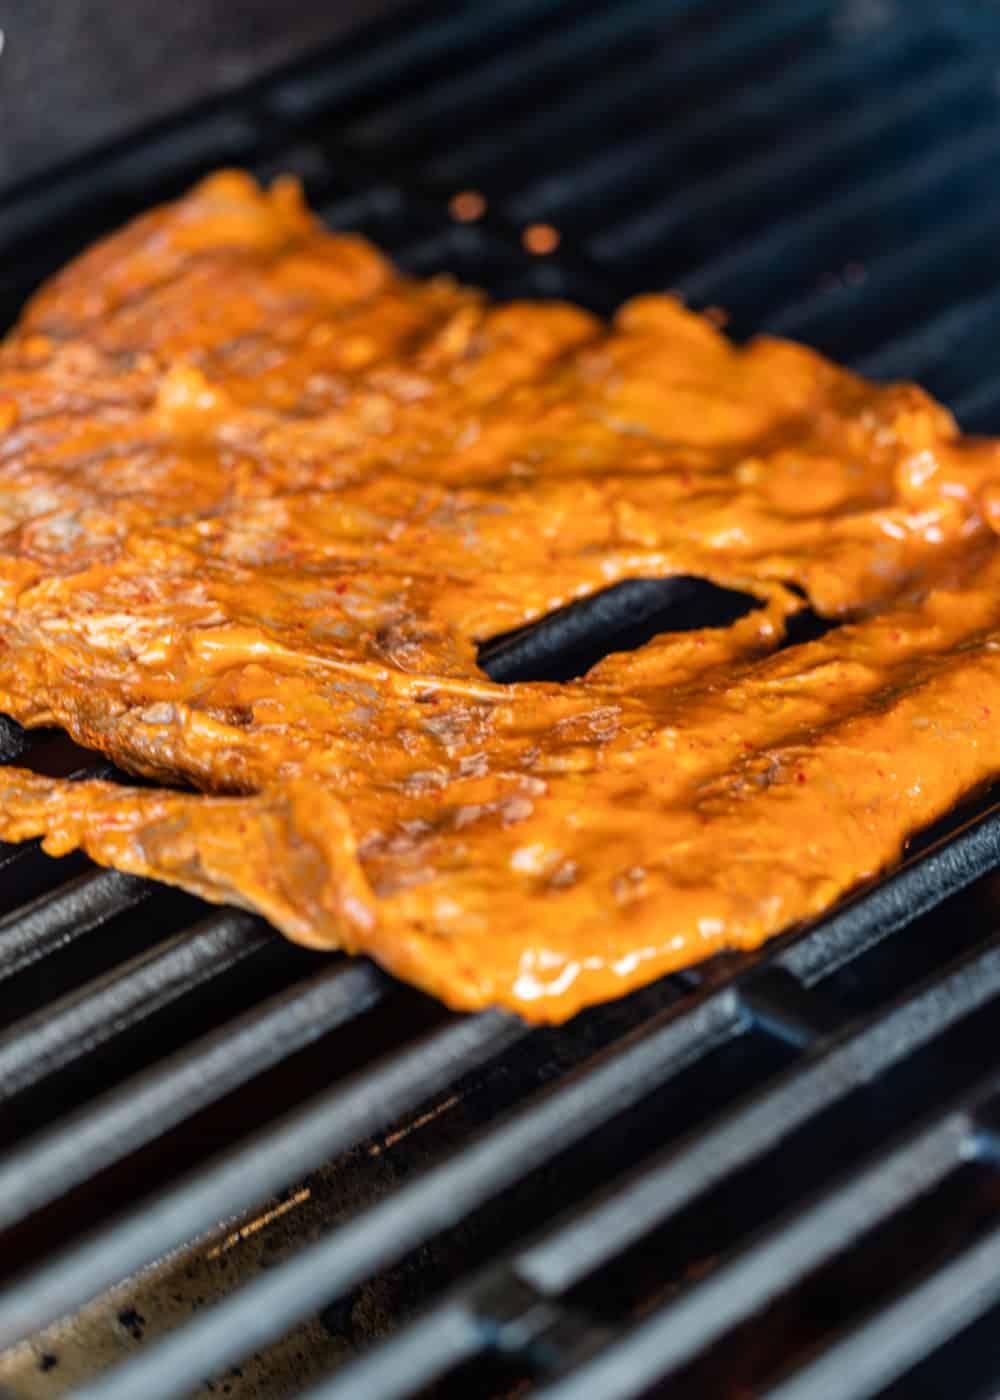 marinated steak on grill